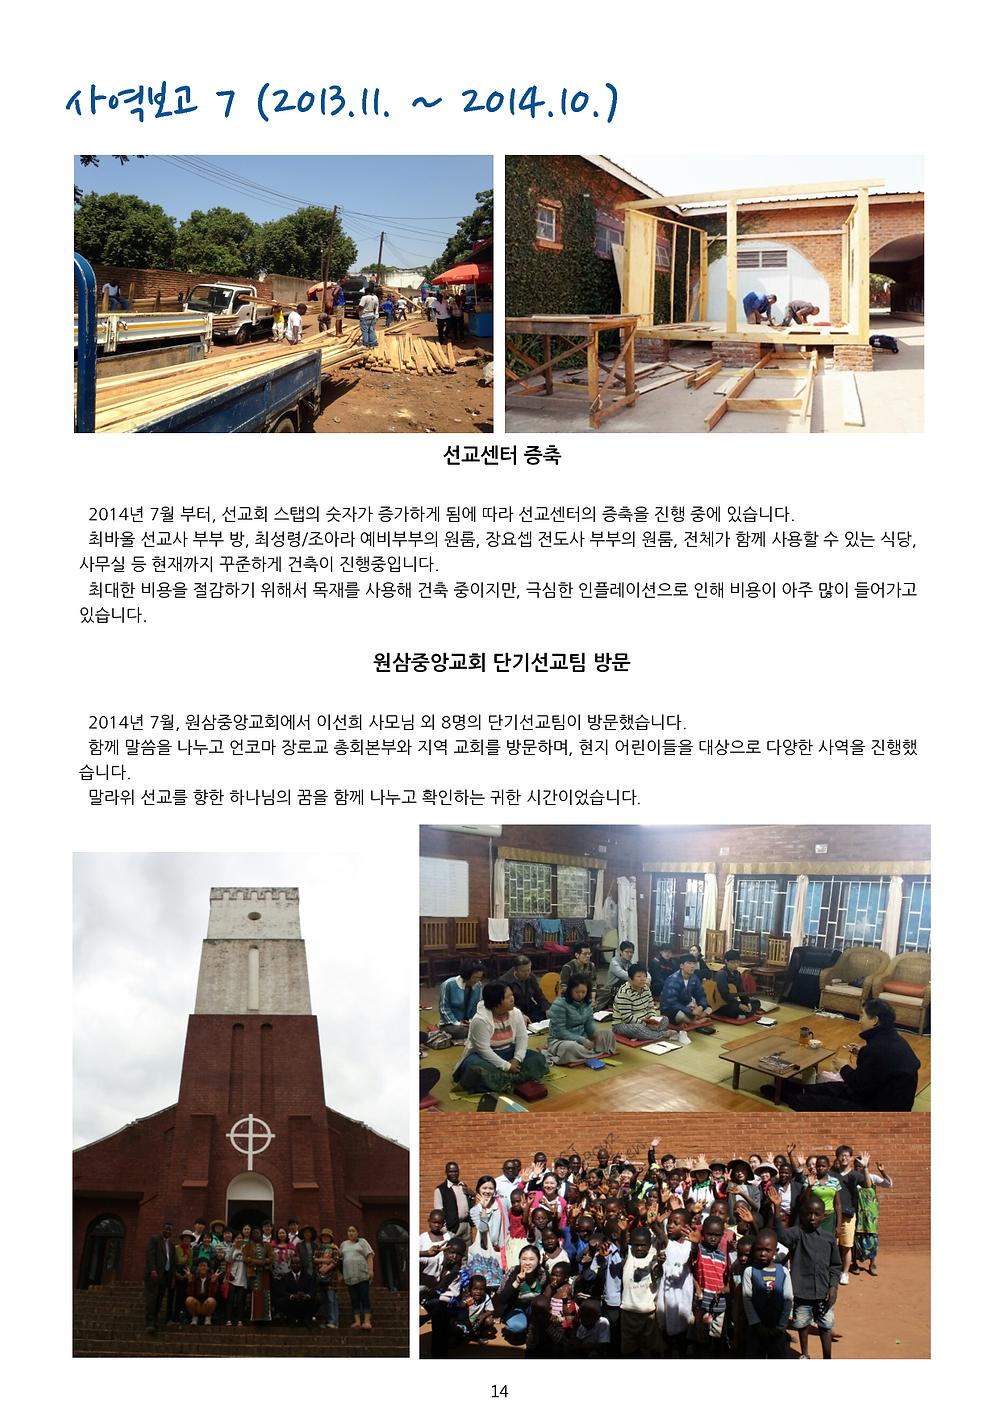 NWM 2014년 선교보고_14.png